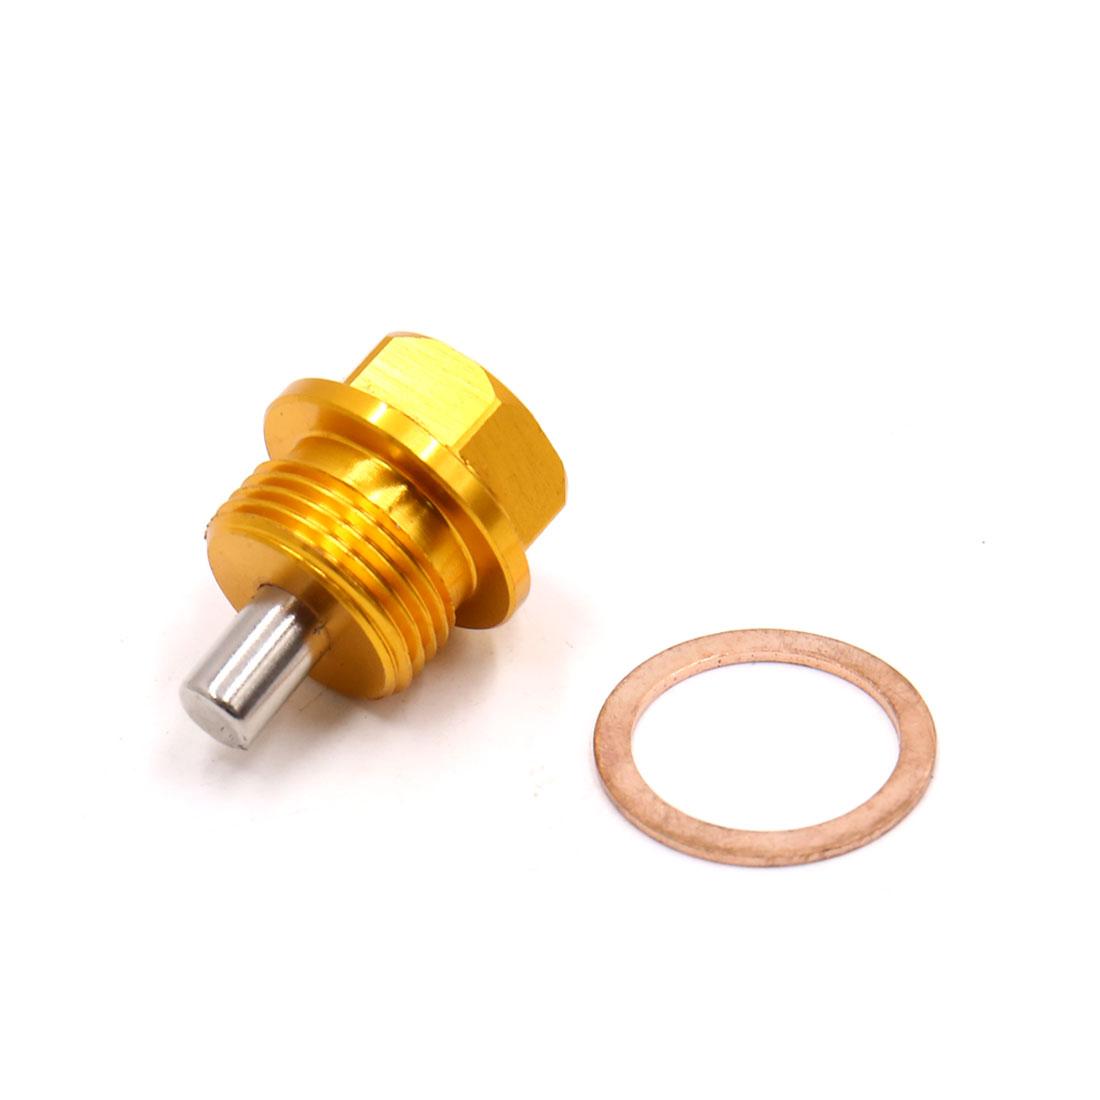 Gold Tone Aluminum Alloy Magnetic Car Engine Oil Pan Drain Bolt